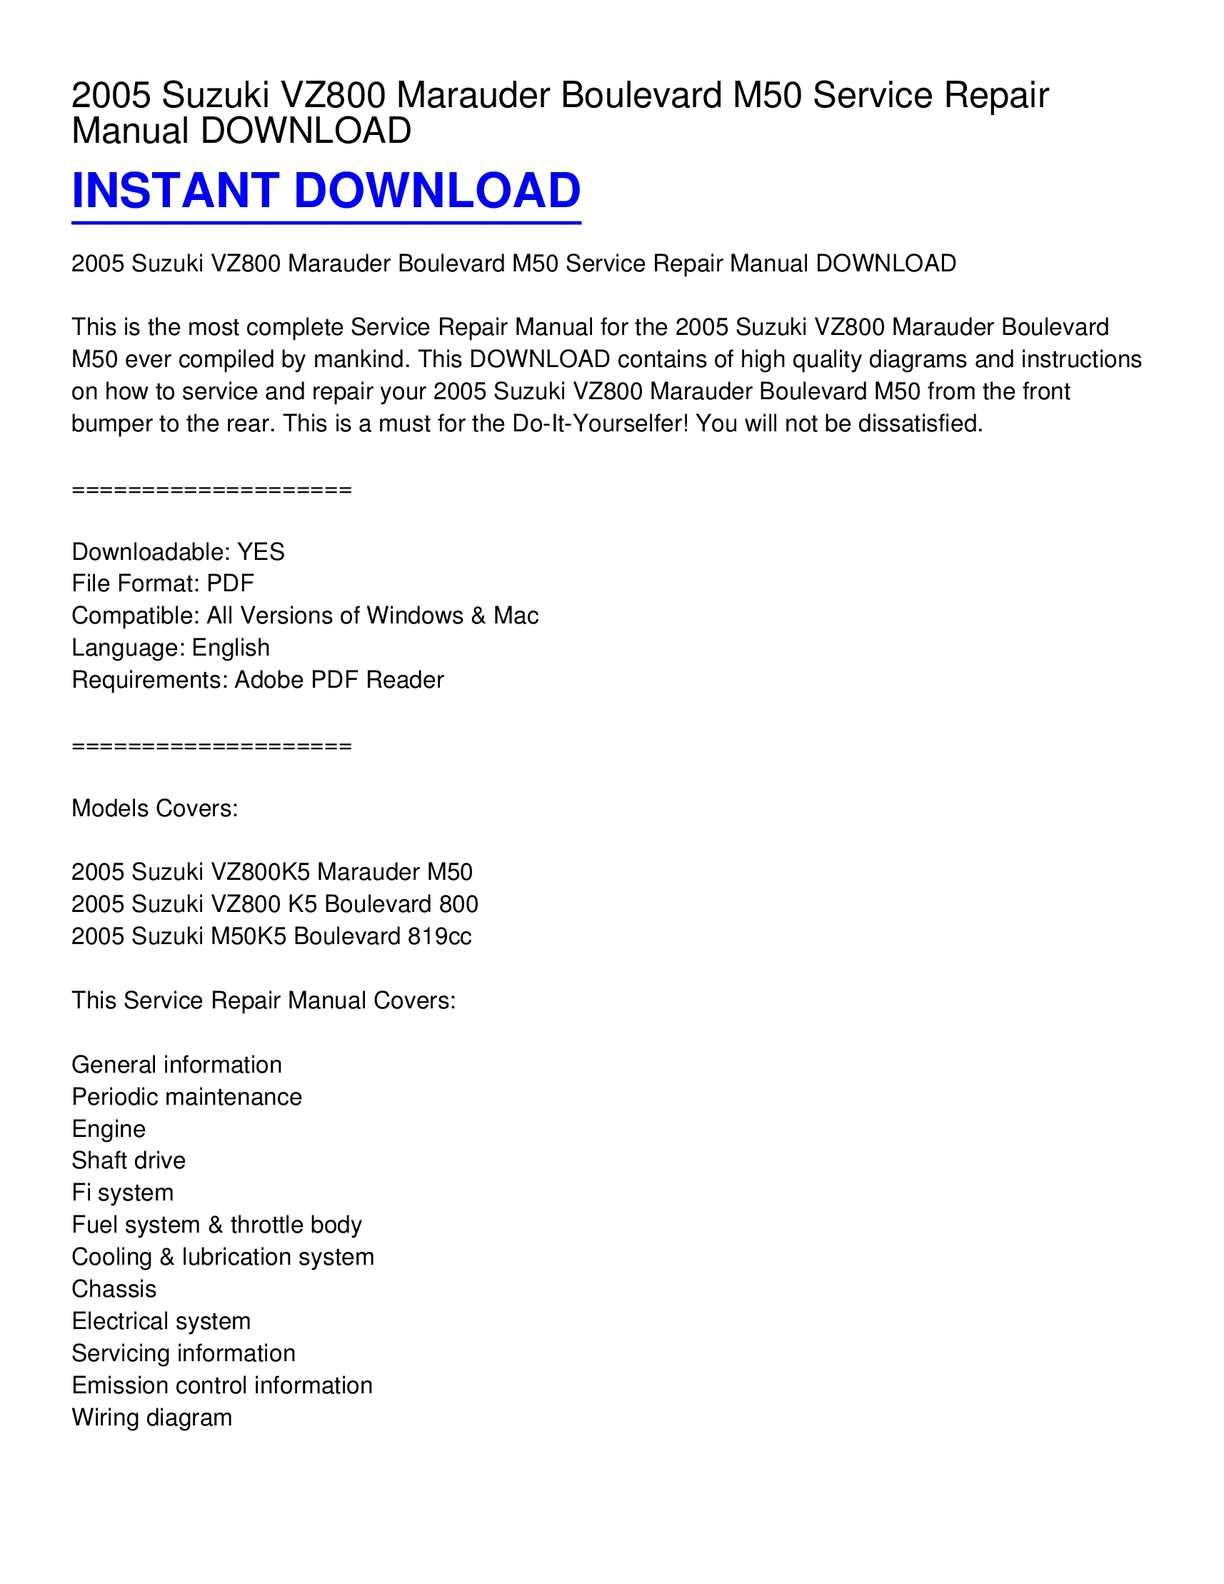 Calaméo - 2005 Suzuki VZ800 Marauder Boulevard M50 Service Repair Manual  DOWNLOAD